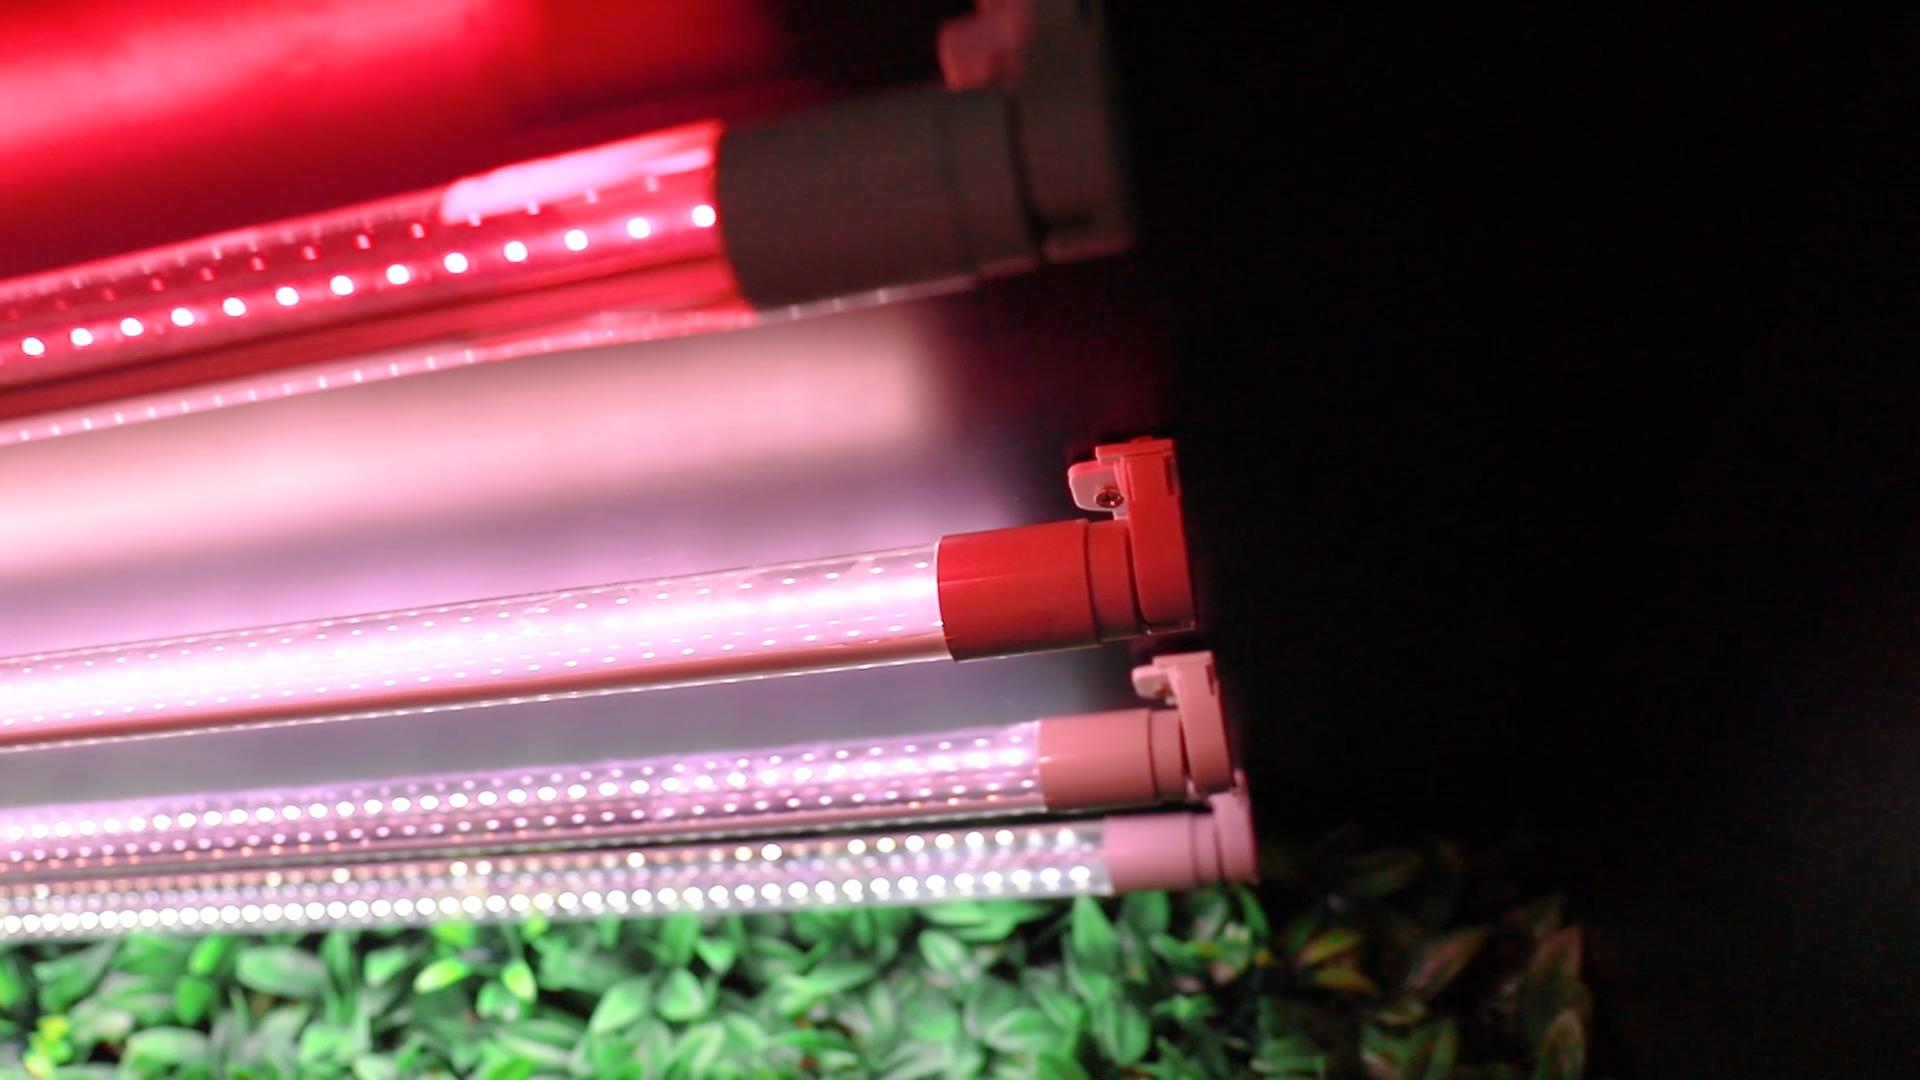 Agricultura Hydrocultuur Dubbele Eindigde Bar Strip Volledige Spectrum T5 T8 Led Grow Lichtpunt Led Grow Light Tube